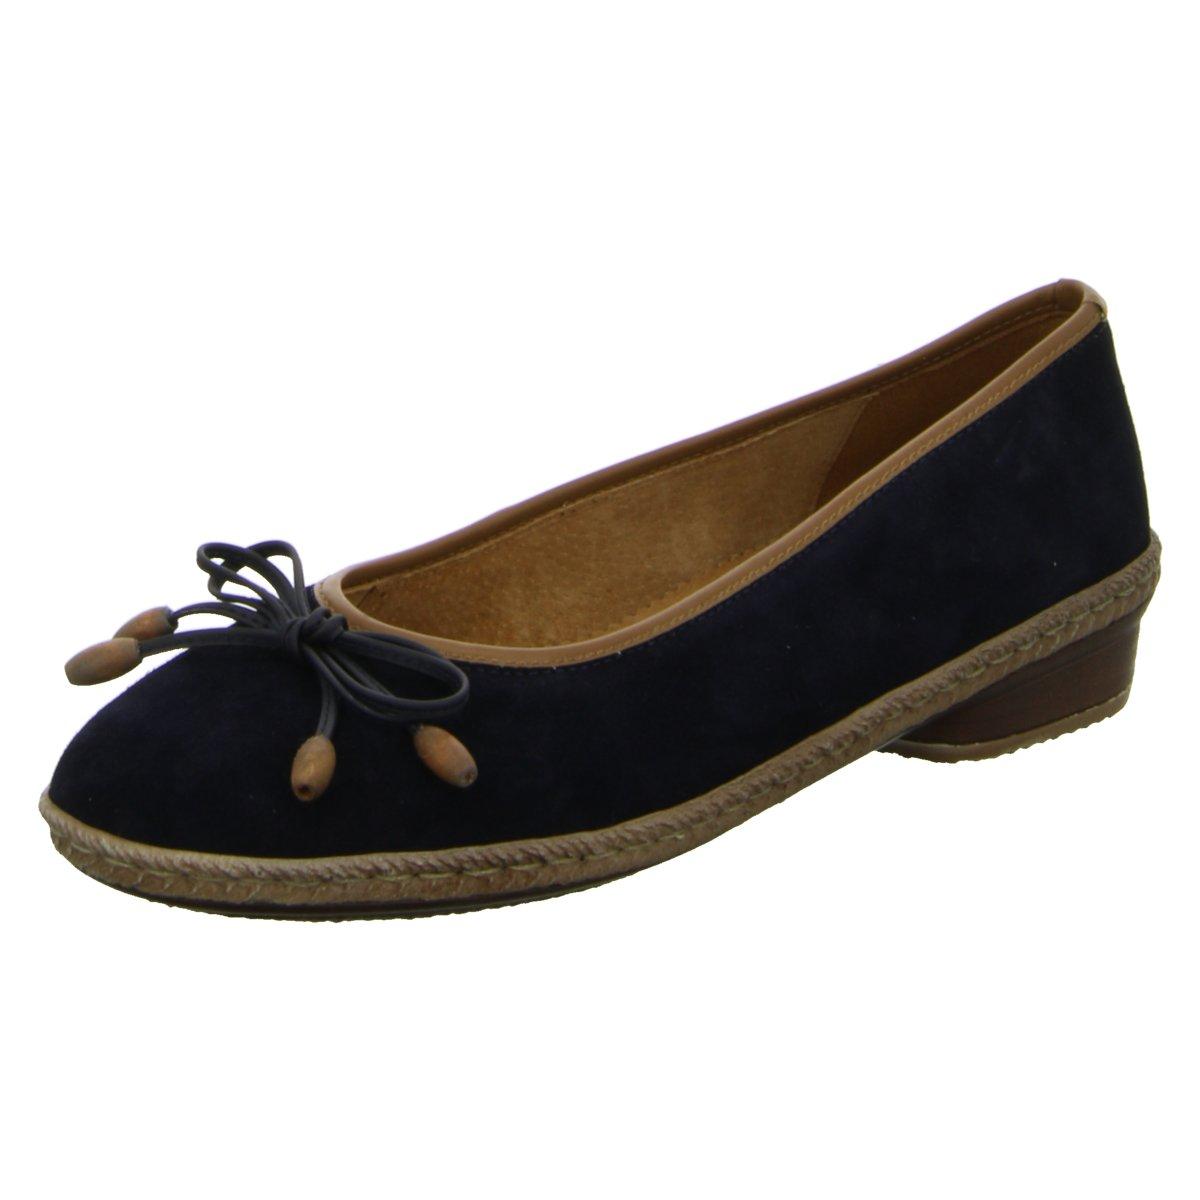 NEU Jenny Damen Ballerinas Komfort Pumps eleganter Boden 2-52968-05 blau 137796